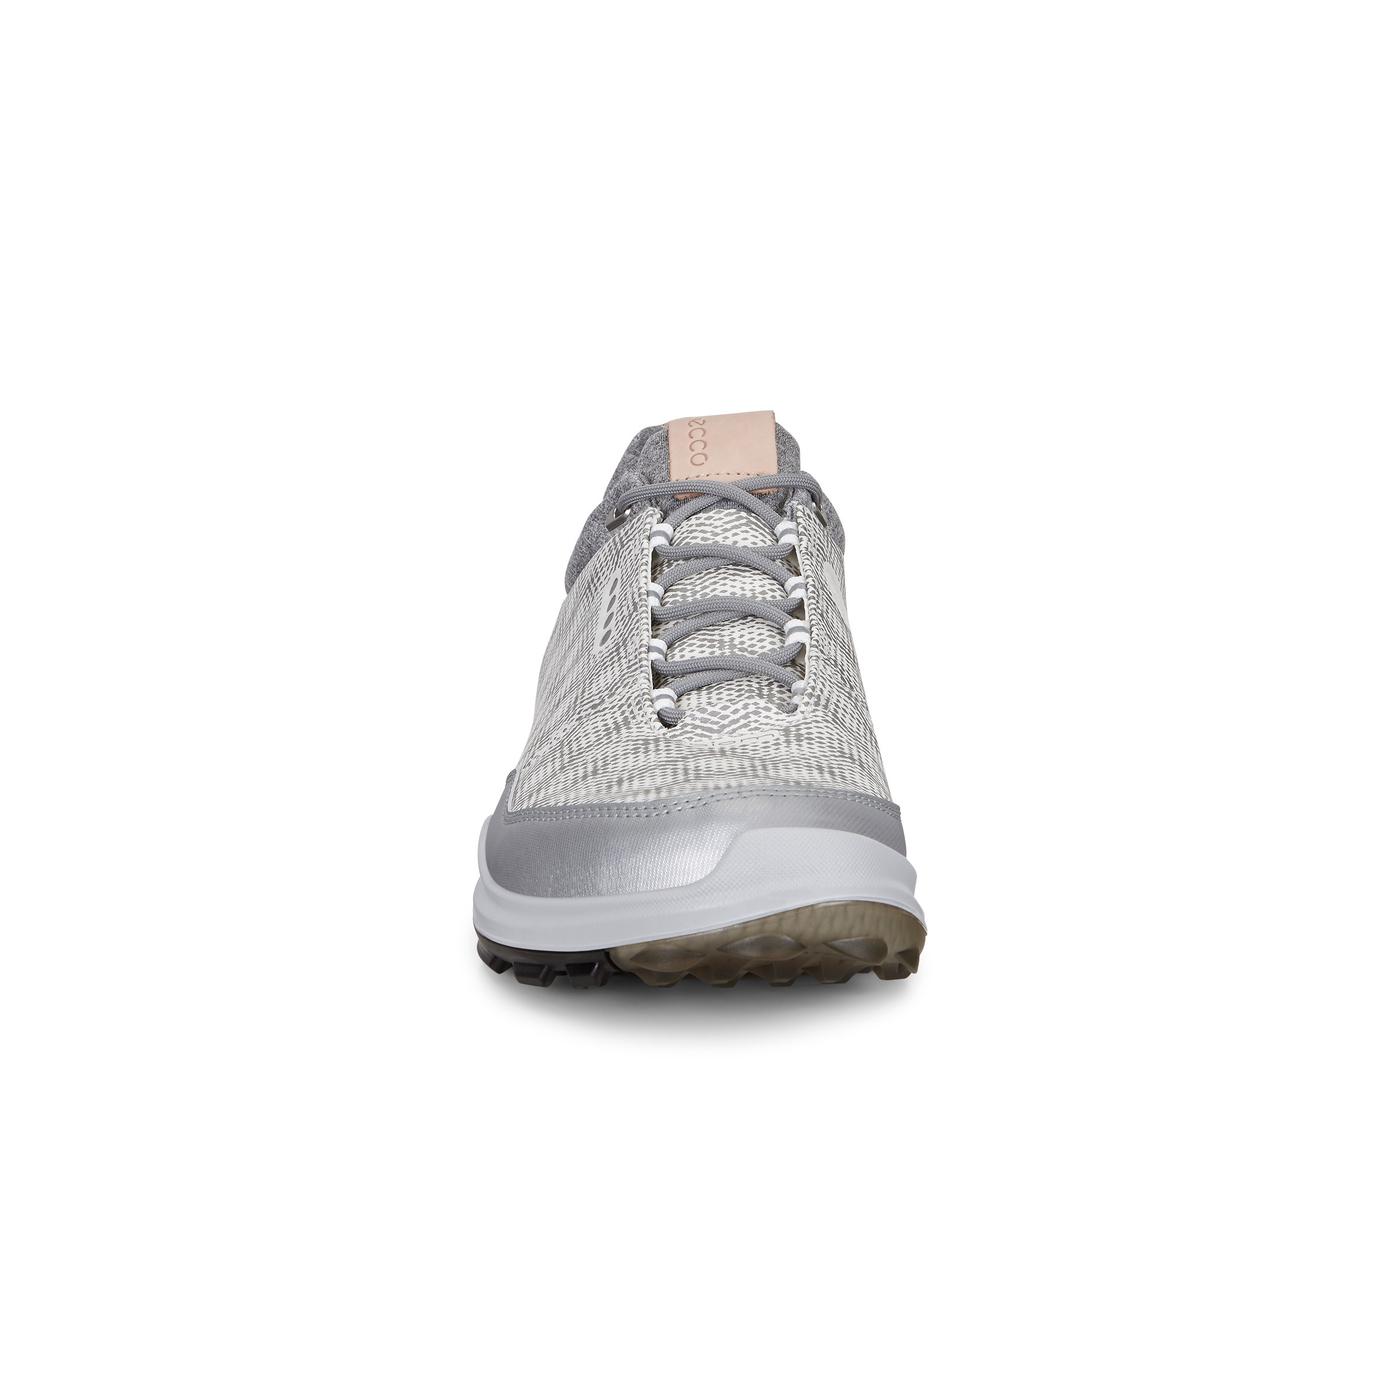 ECCO BIOM HYBRID 3 GTX Men's Shoe